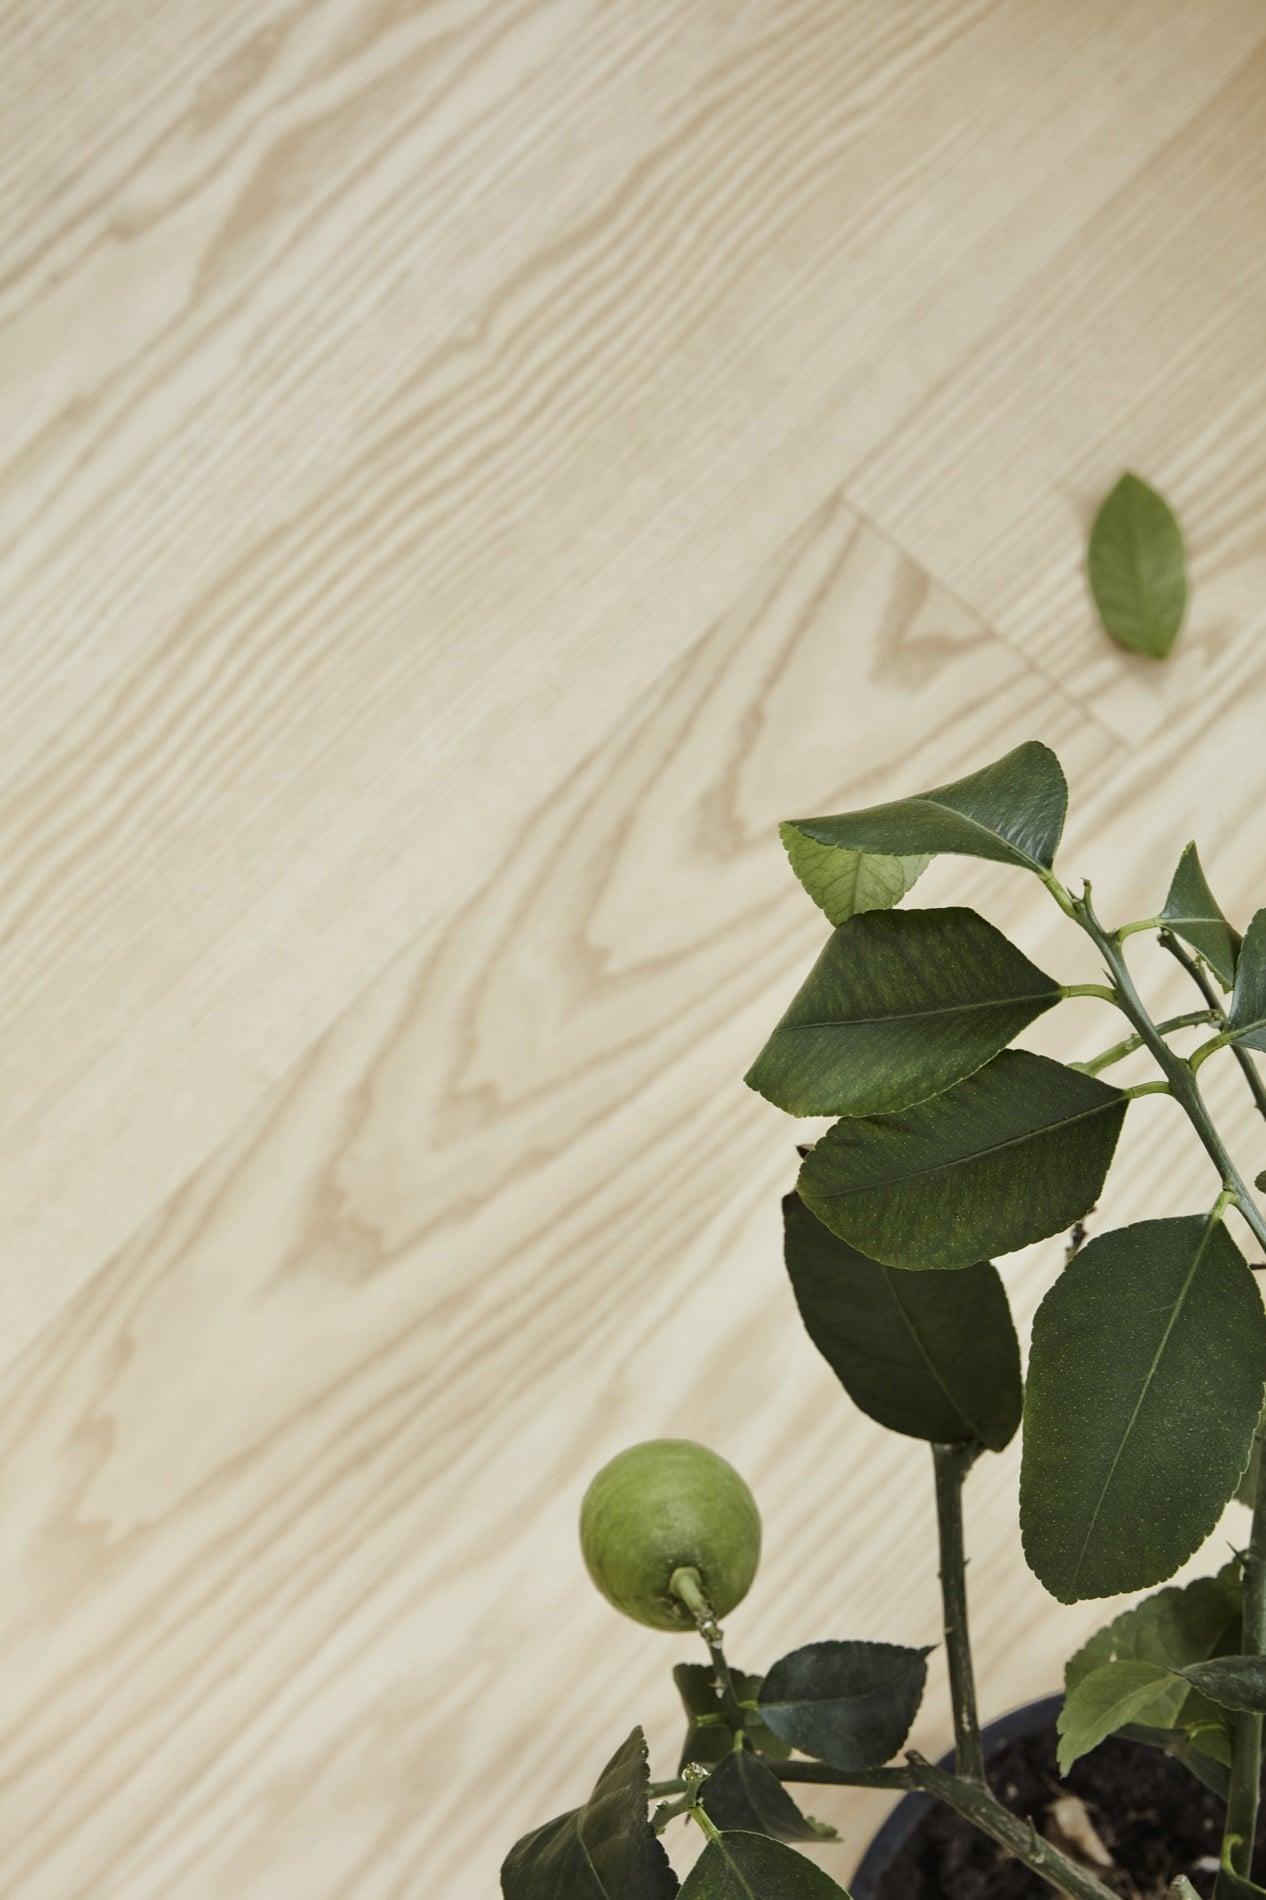 Timberwise parketti puulattia wooden floor parquet Saarni Ash Select îljyvaha wax oil_lahis1